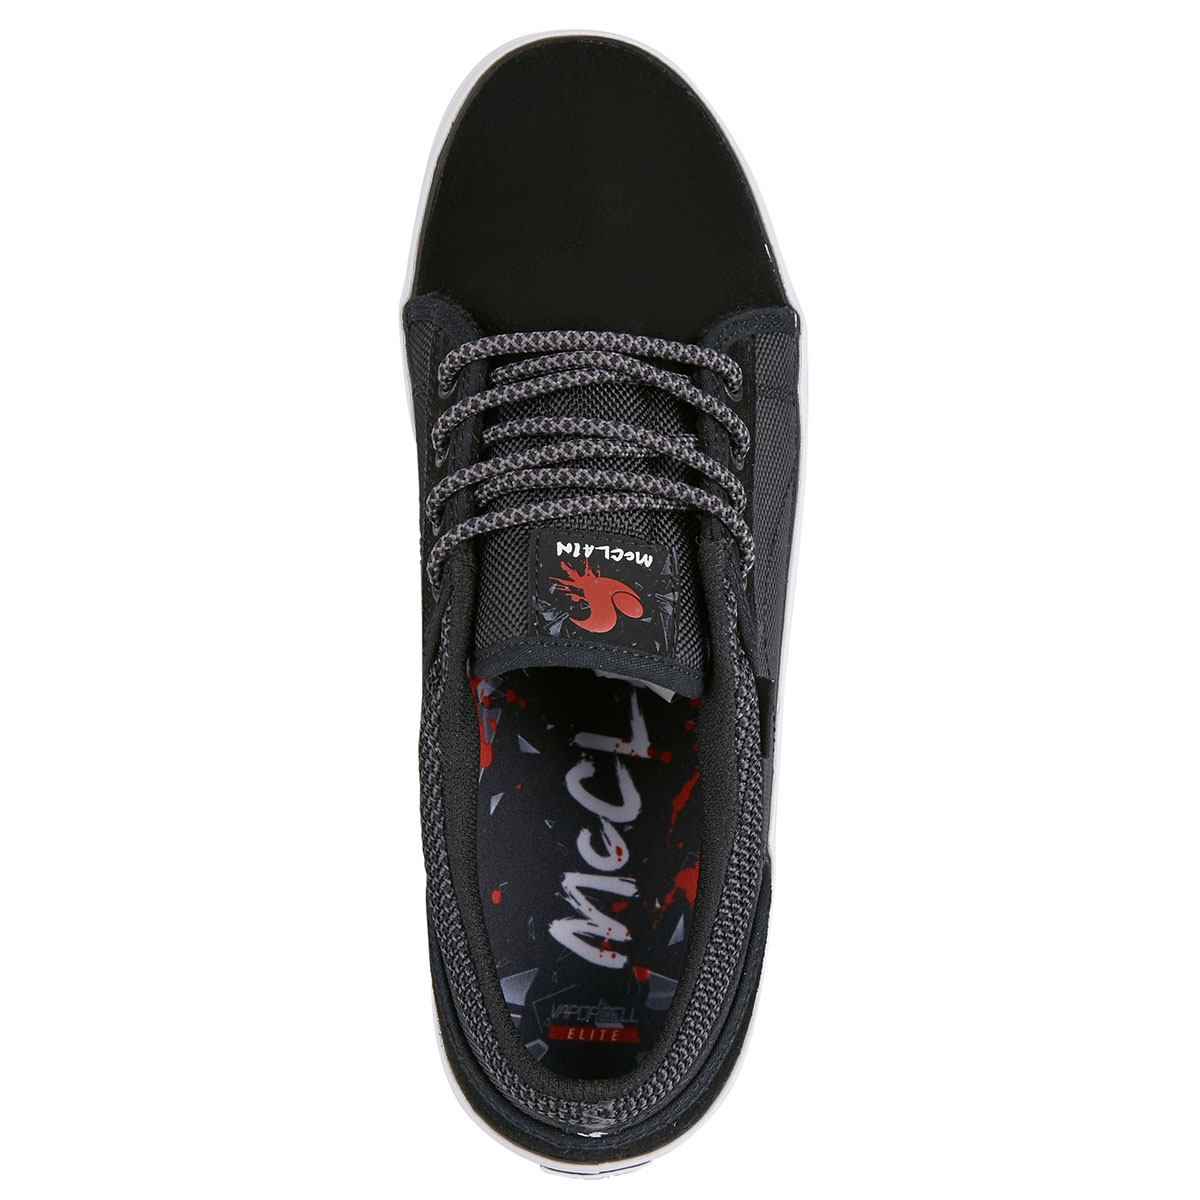 DVS Shoes Aversa+ Black Suede McClain | Maciag Offroad